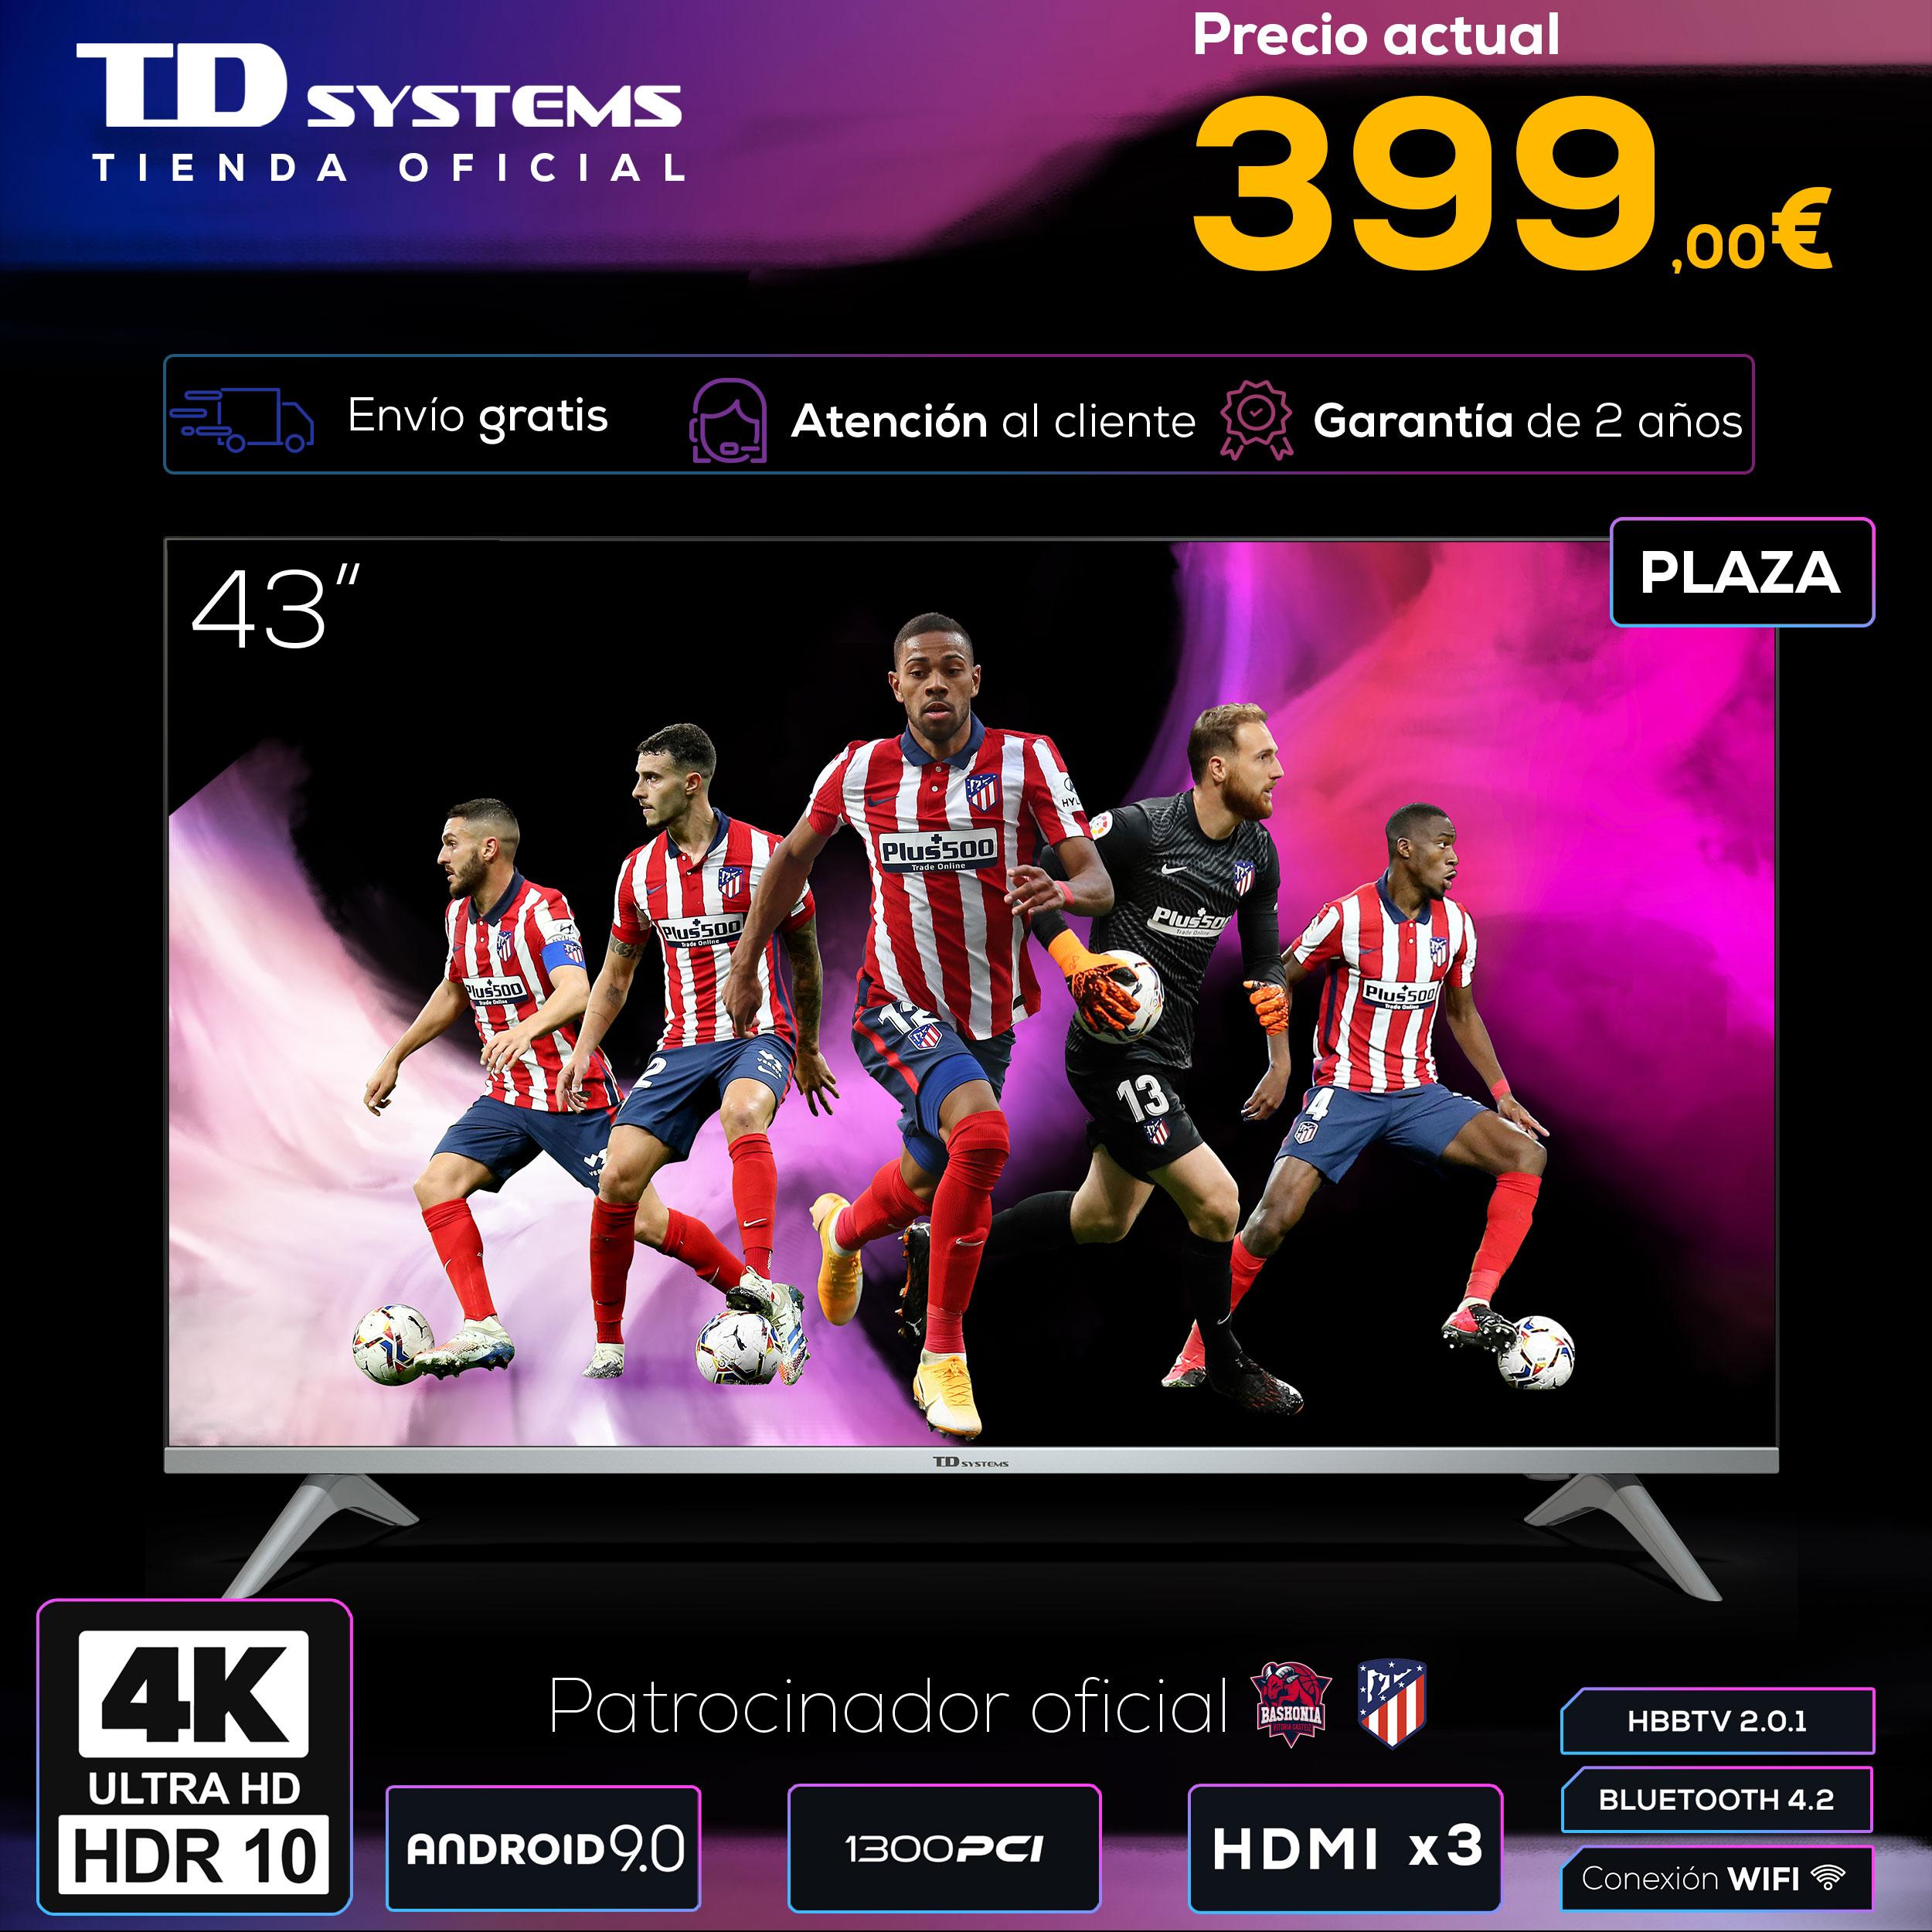 Televisores Smart TV 43 Pulgadas TD Systems K43DLX11US. UHD 4K HDR, DVB T2/C/S2, HbbTV [Envío desde España, garantía de 2 años]|Smart TV| - AliExpress